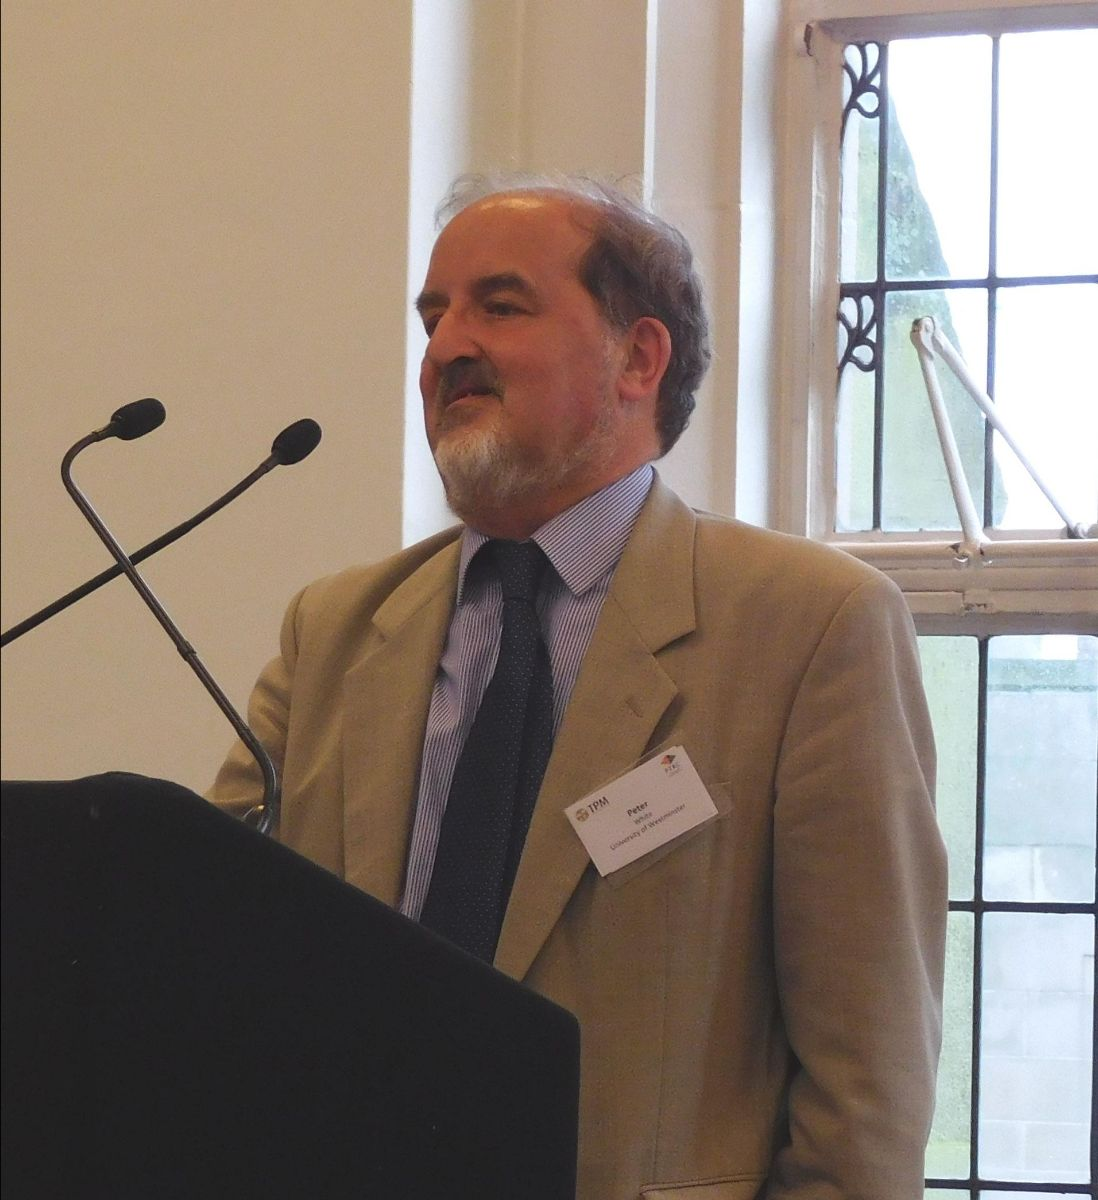 Peter White University Of Westminster